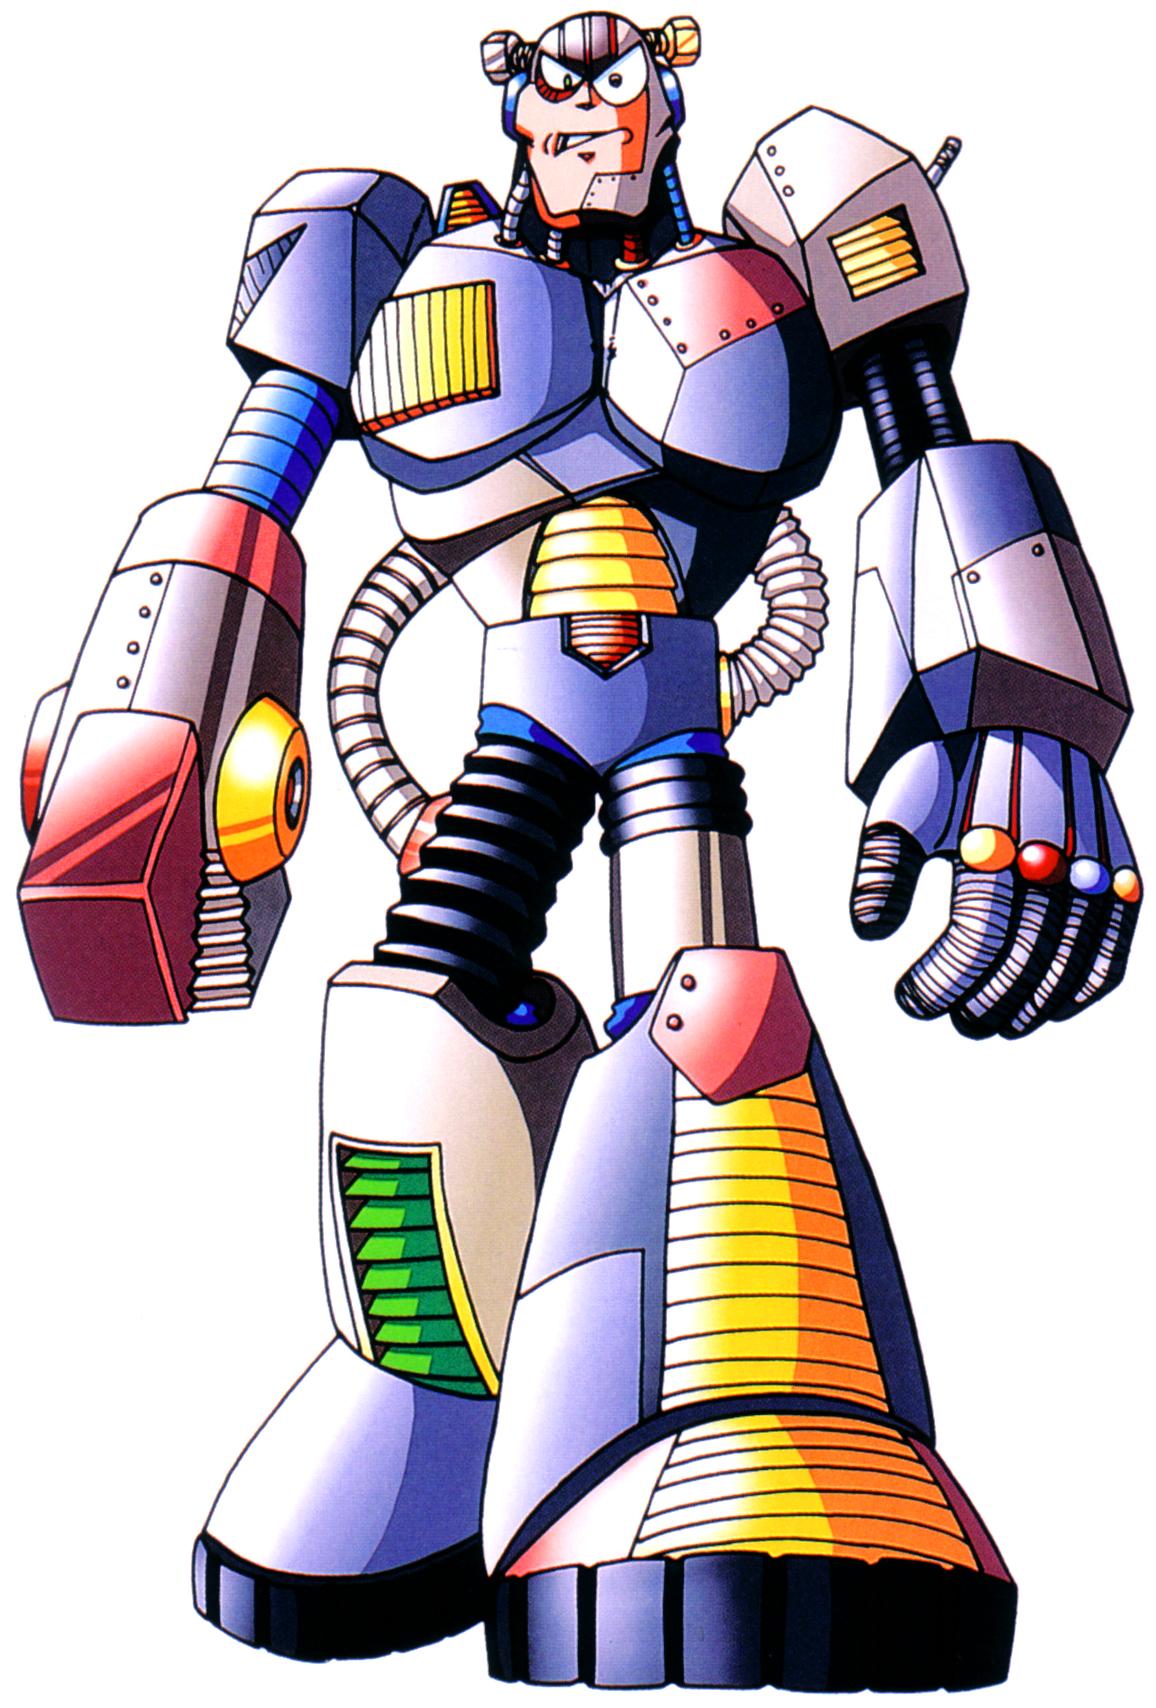 Junk man mmkb fandom powered by wikia - Megaman wikia ...